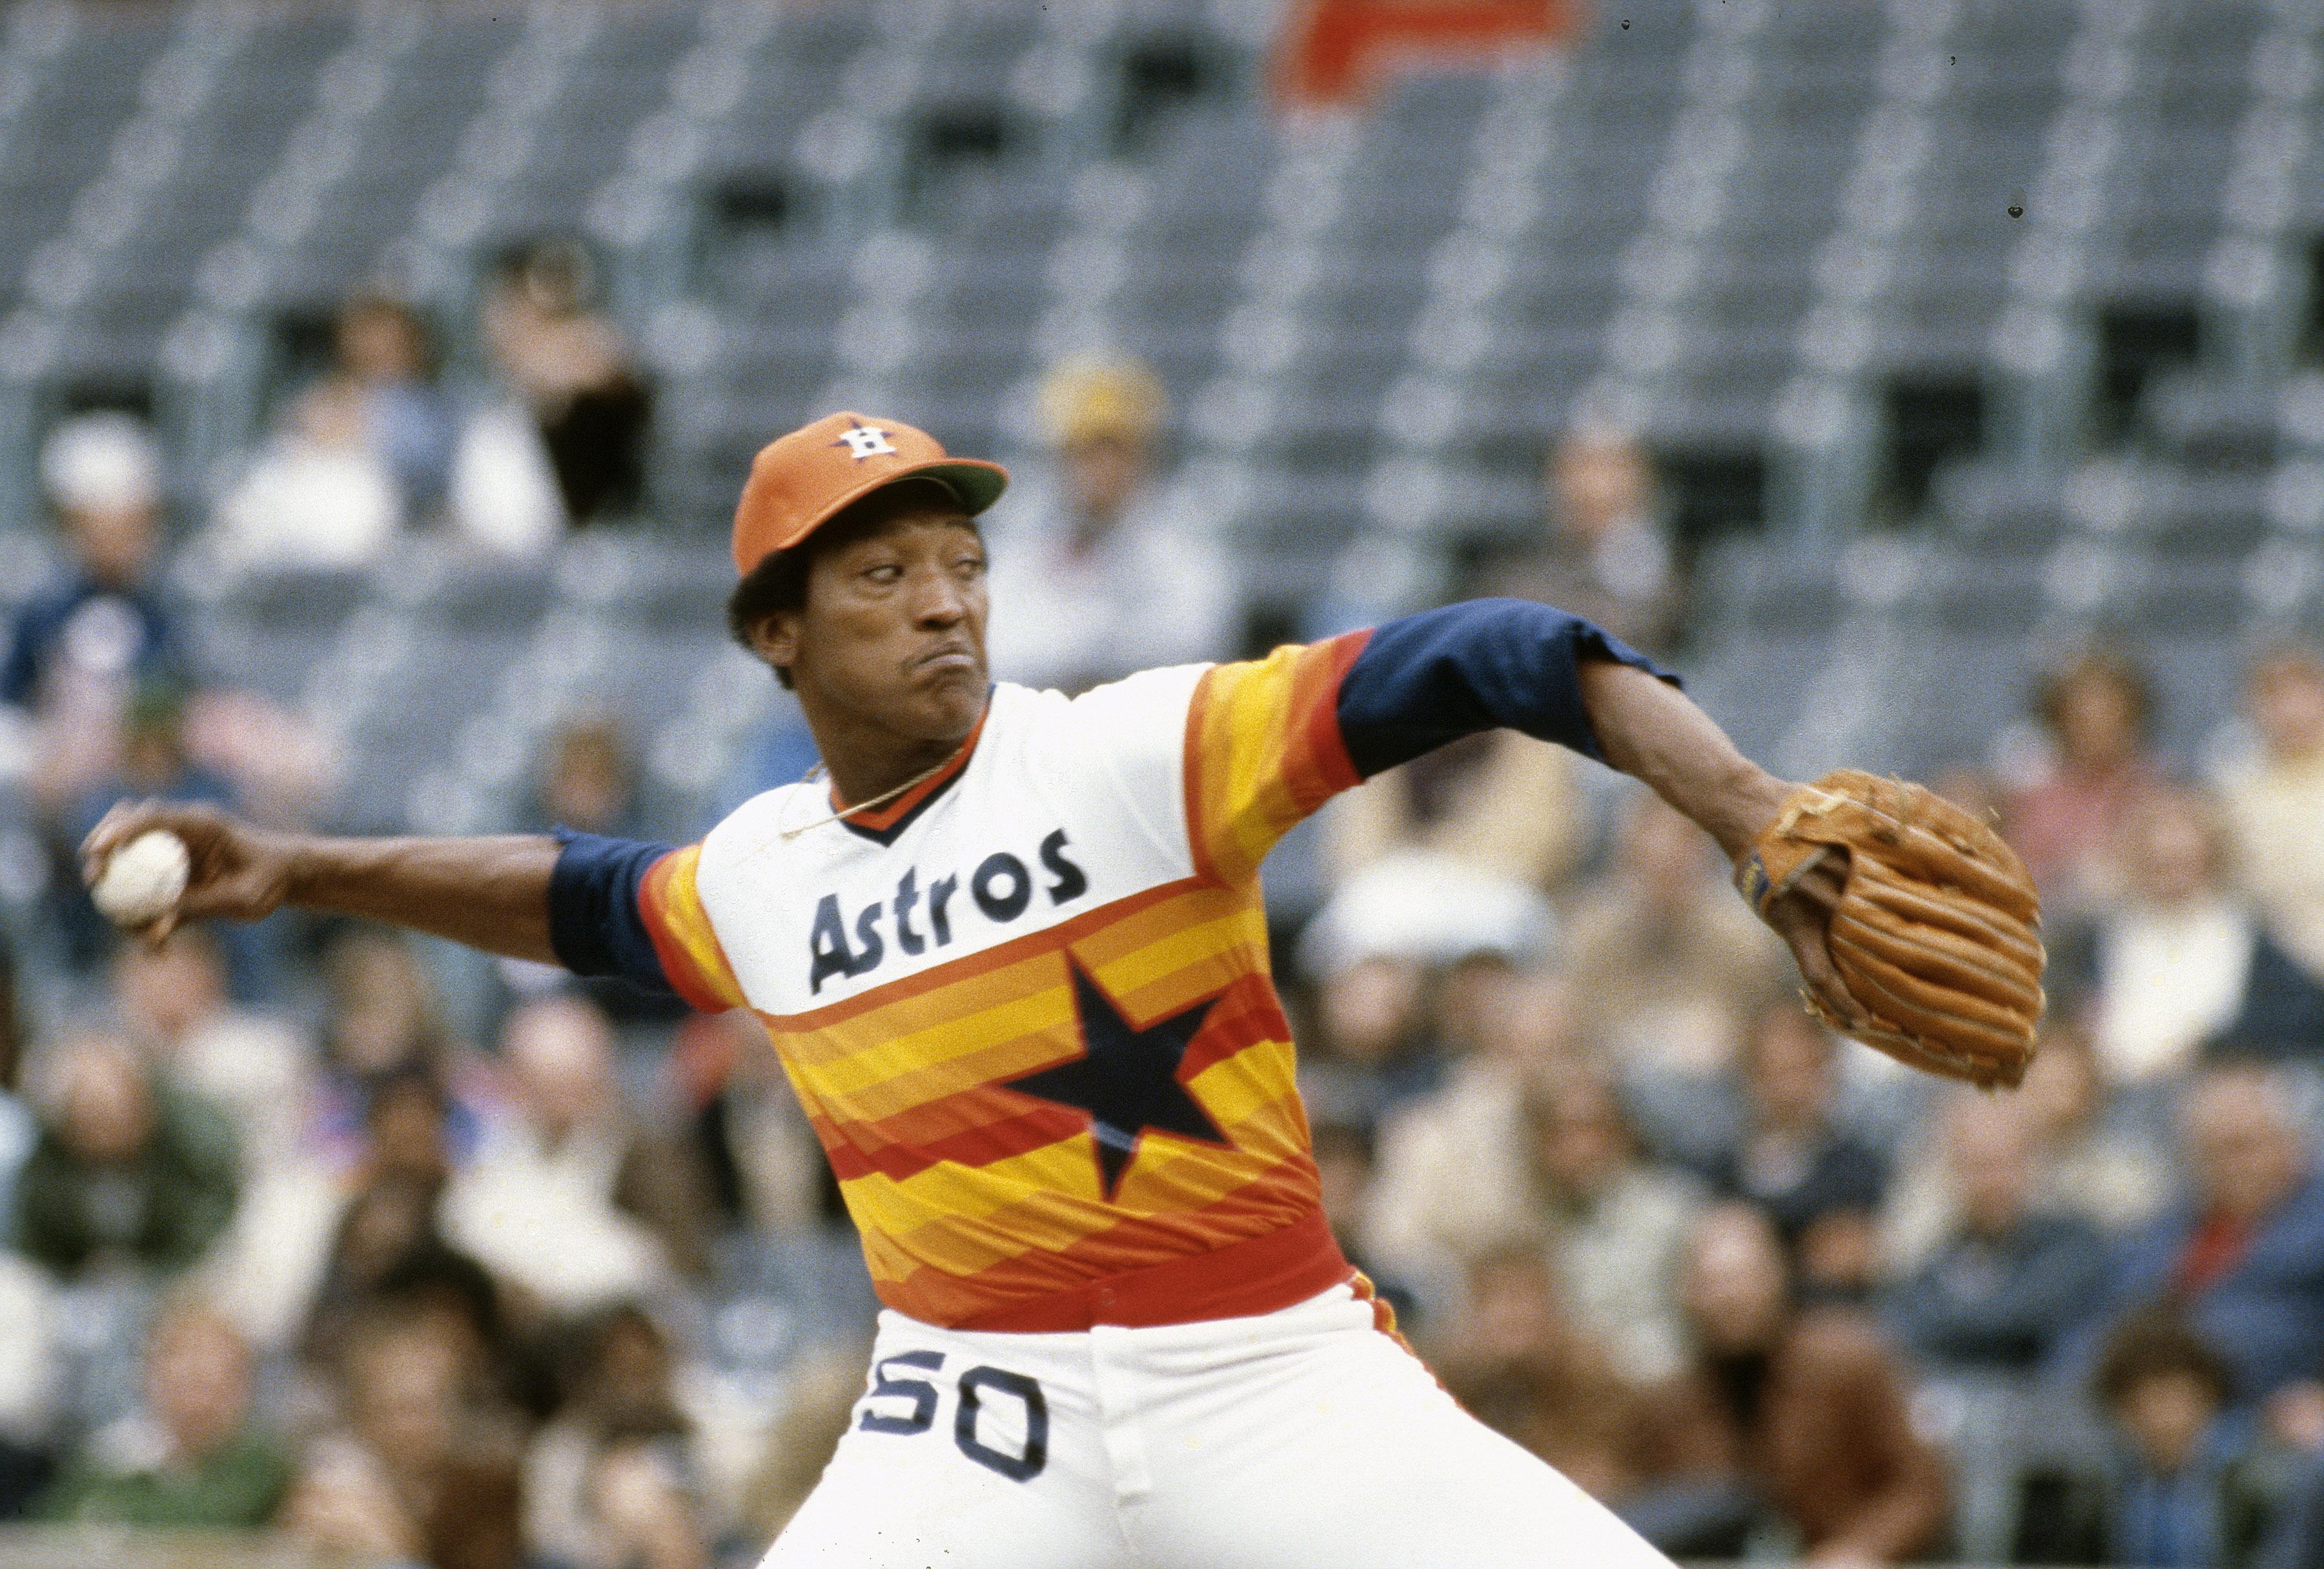 Former Astros Pitcher J.R. Richard Dies at Age 71